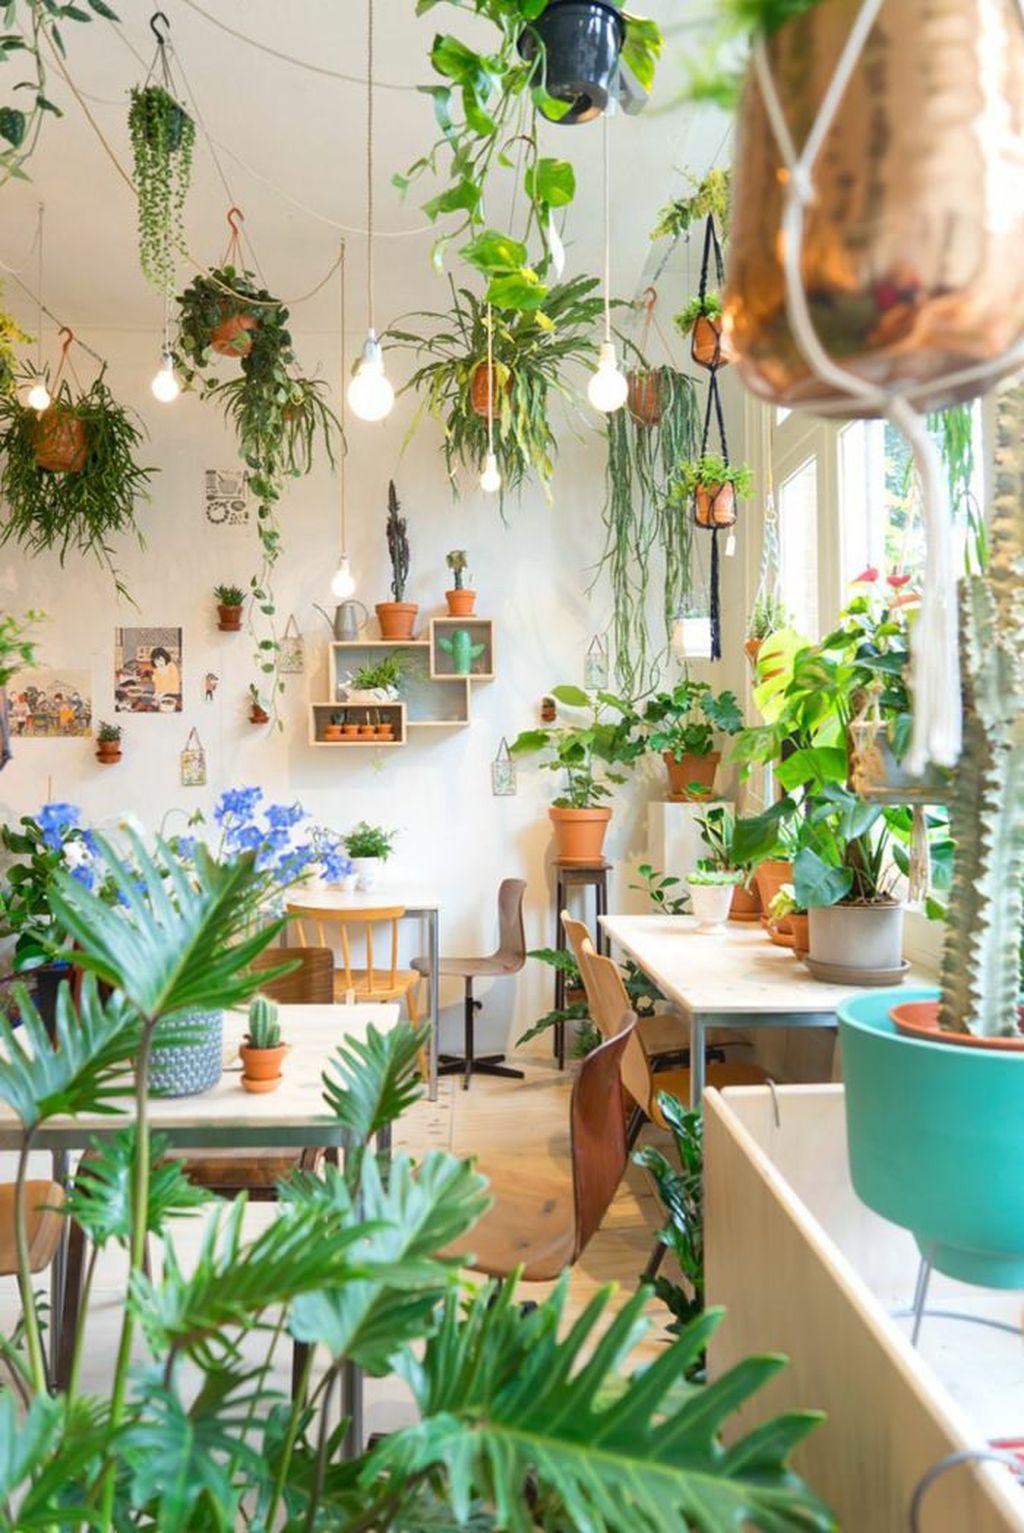 Inspiring Indoor Plans Garden Ideas To Makes Your Home More Cozier 17